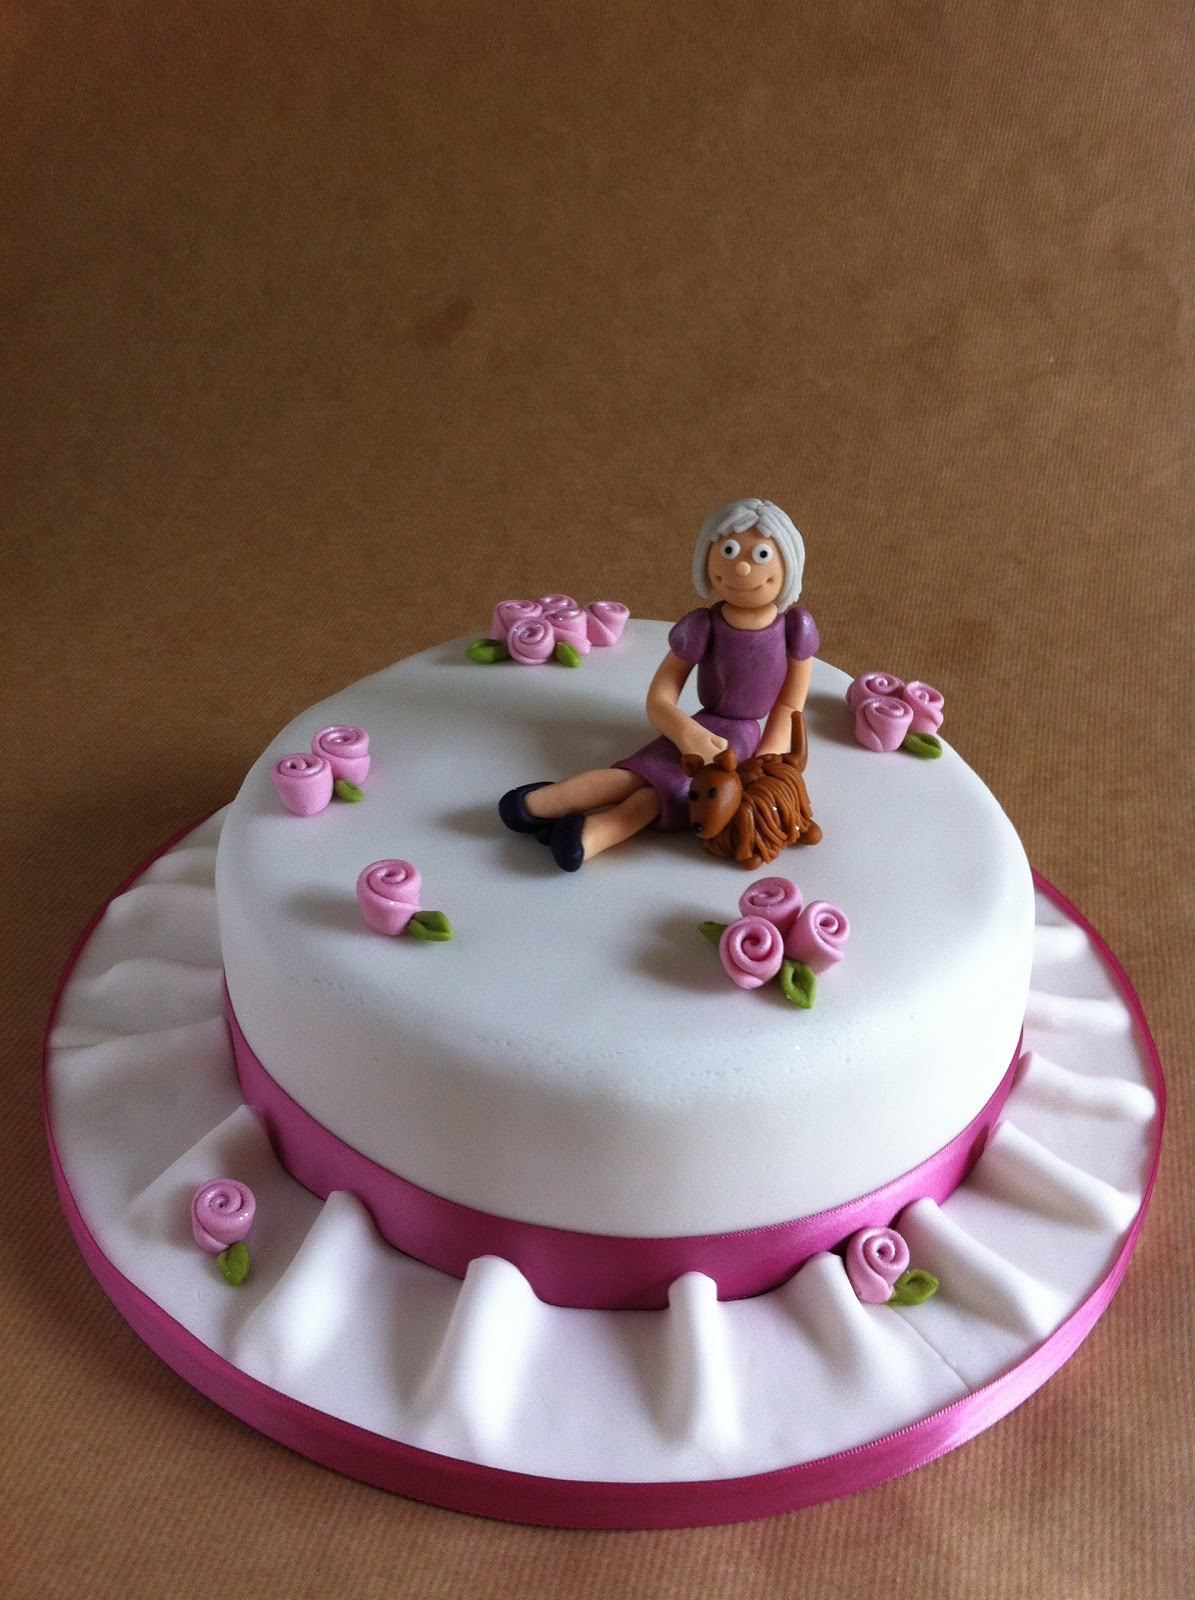 Grannys 80th Birthday Buy A Cake